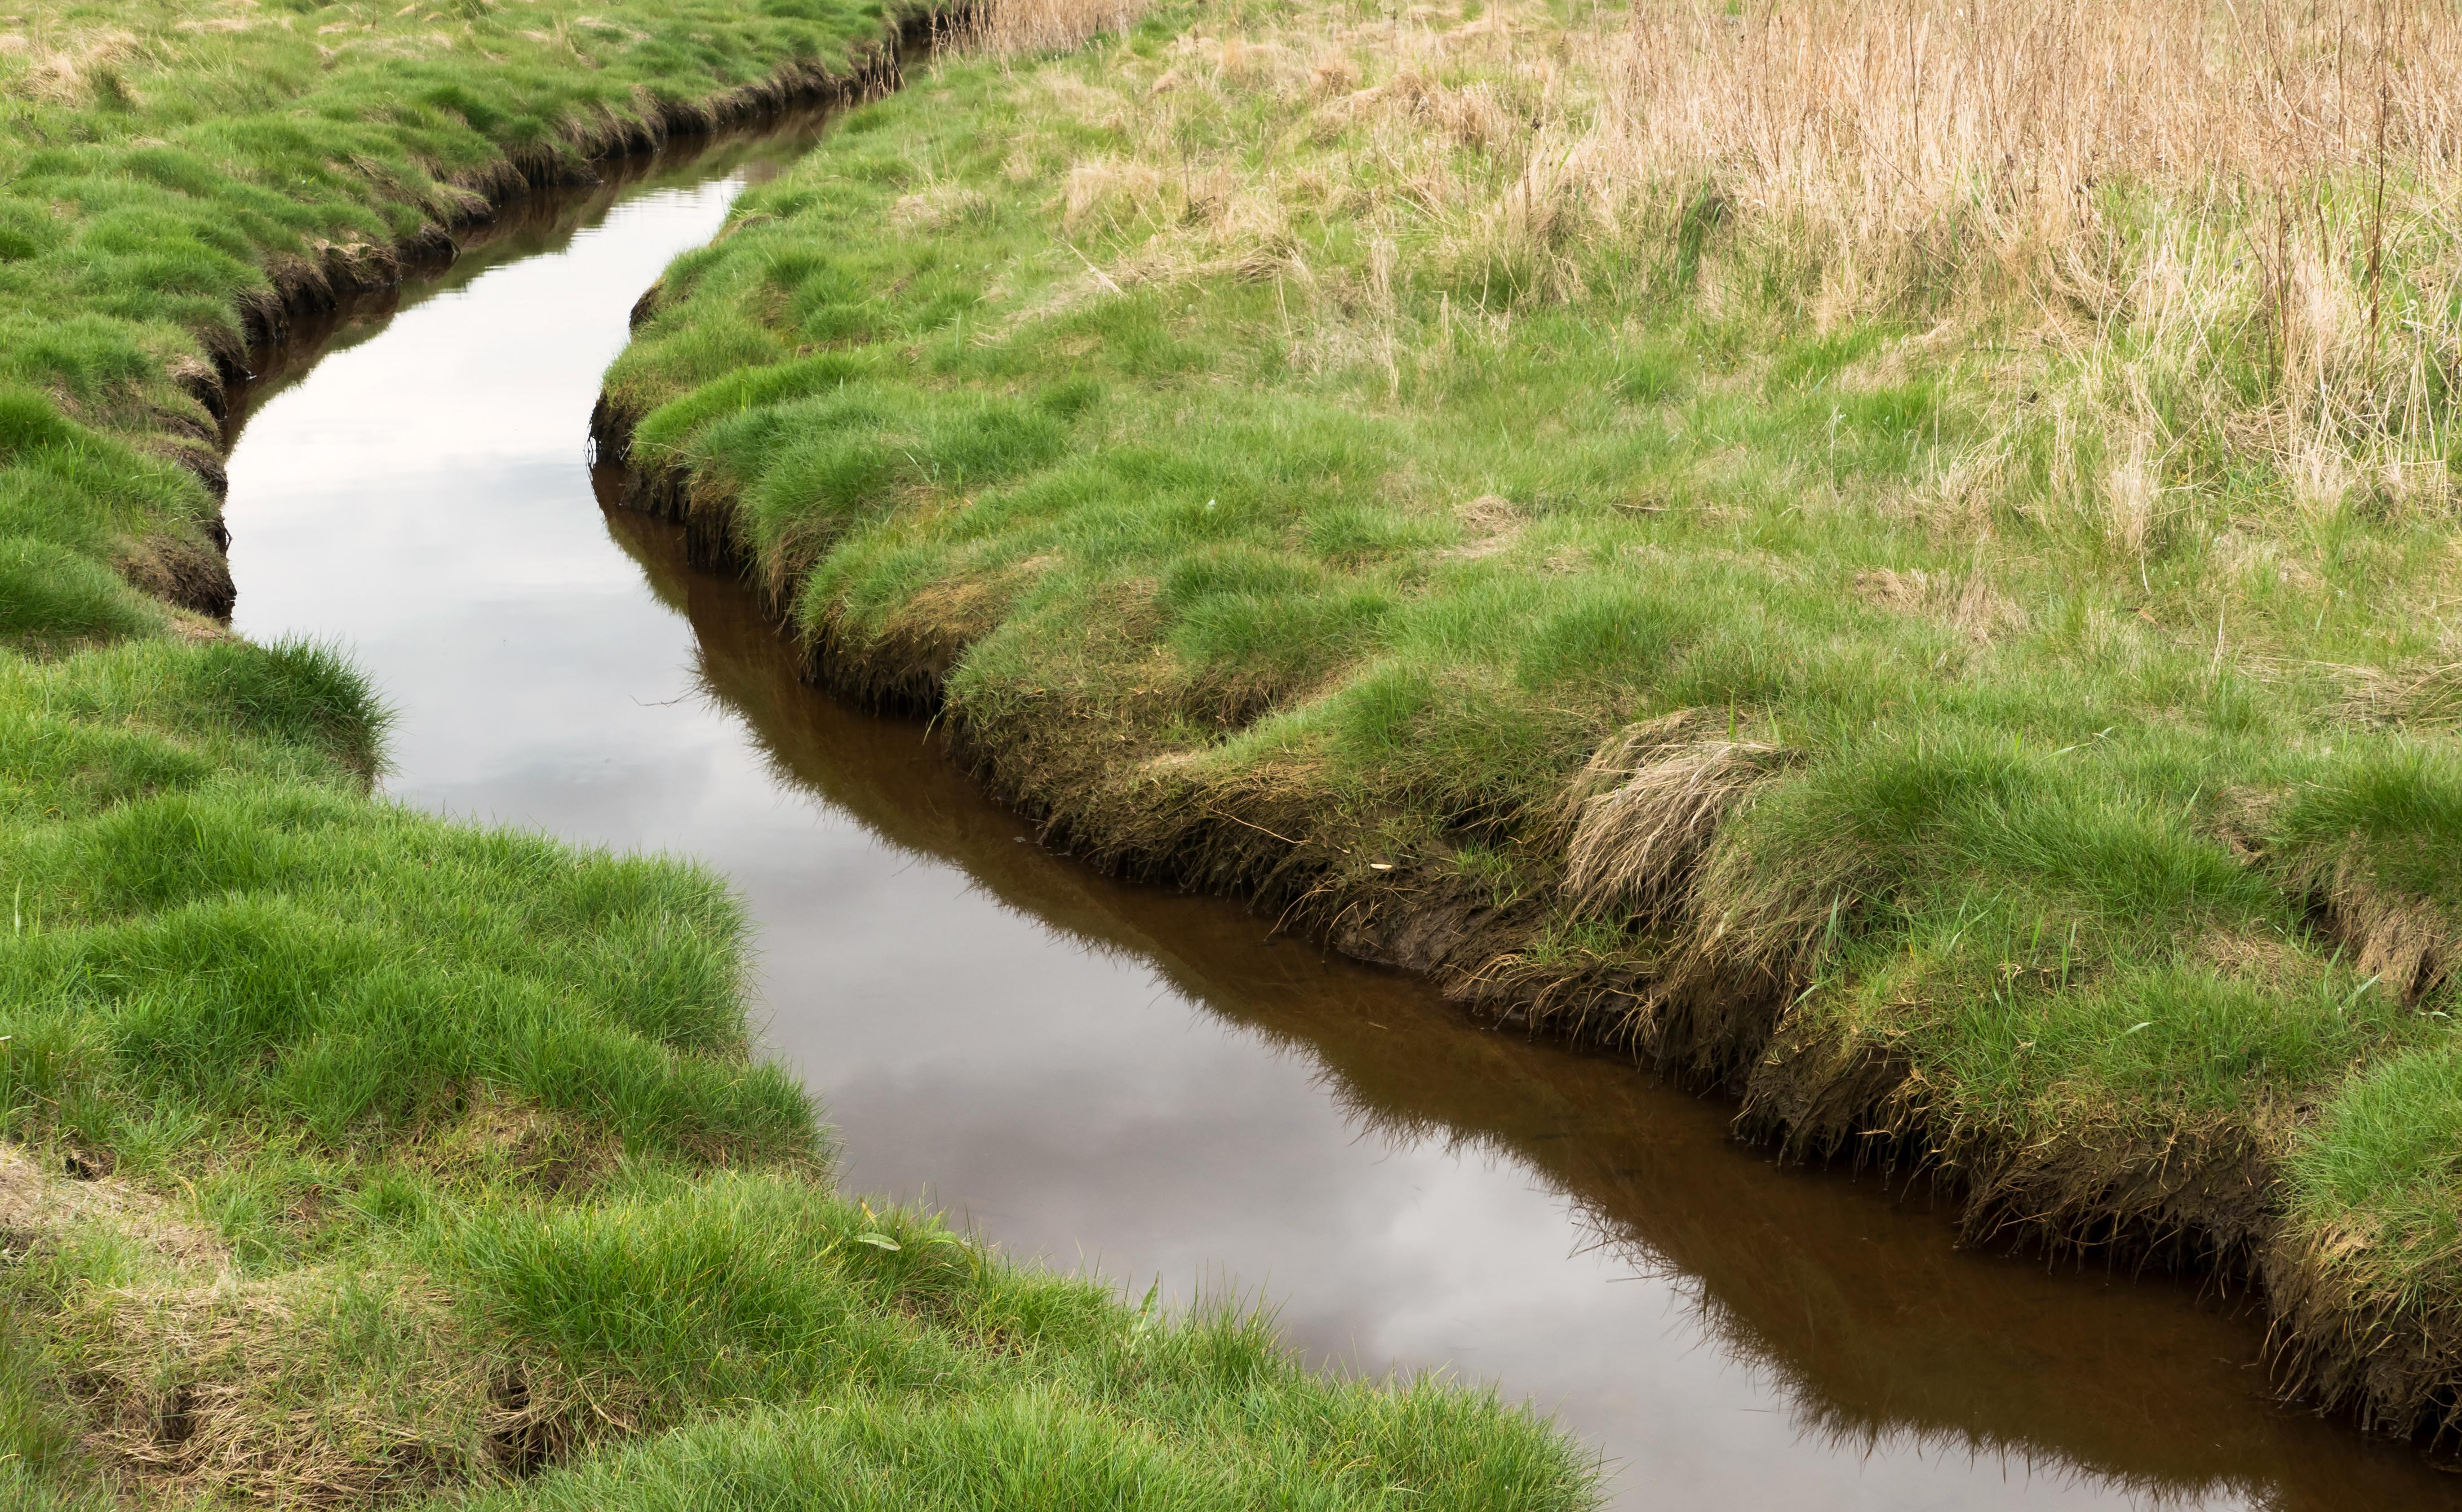 Stream at Gullmarsvik 3, Grass, Lysekil, Overcast, Reflection, HQ Photo